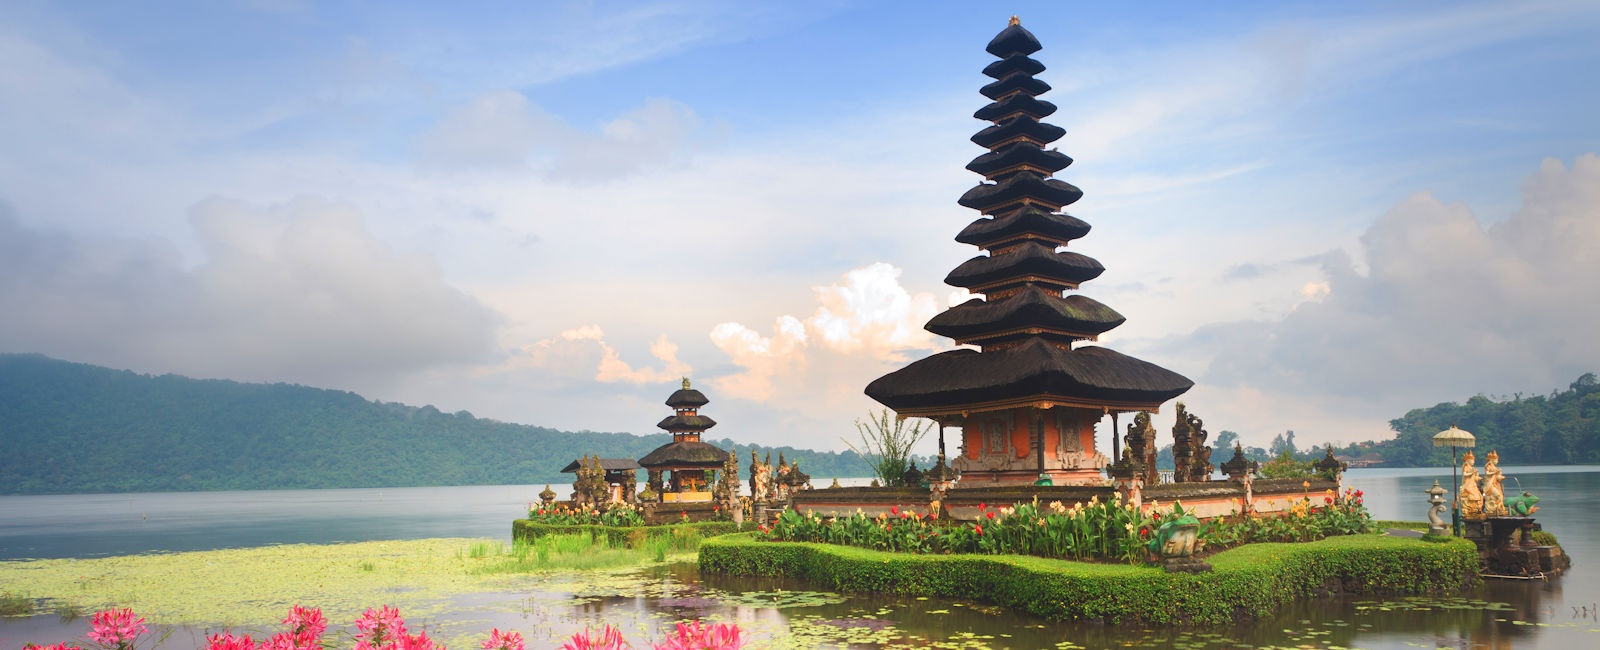 Indonesia, main image